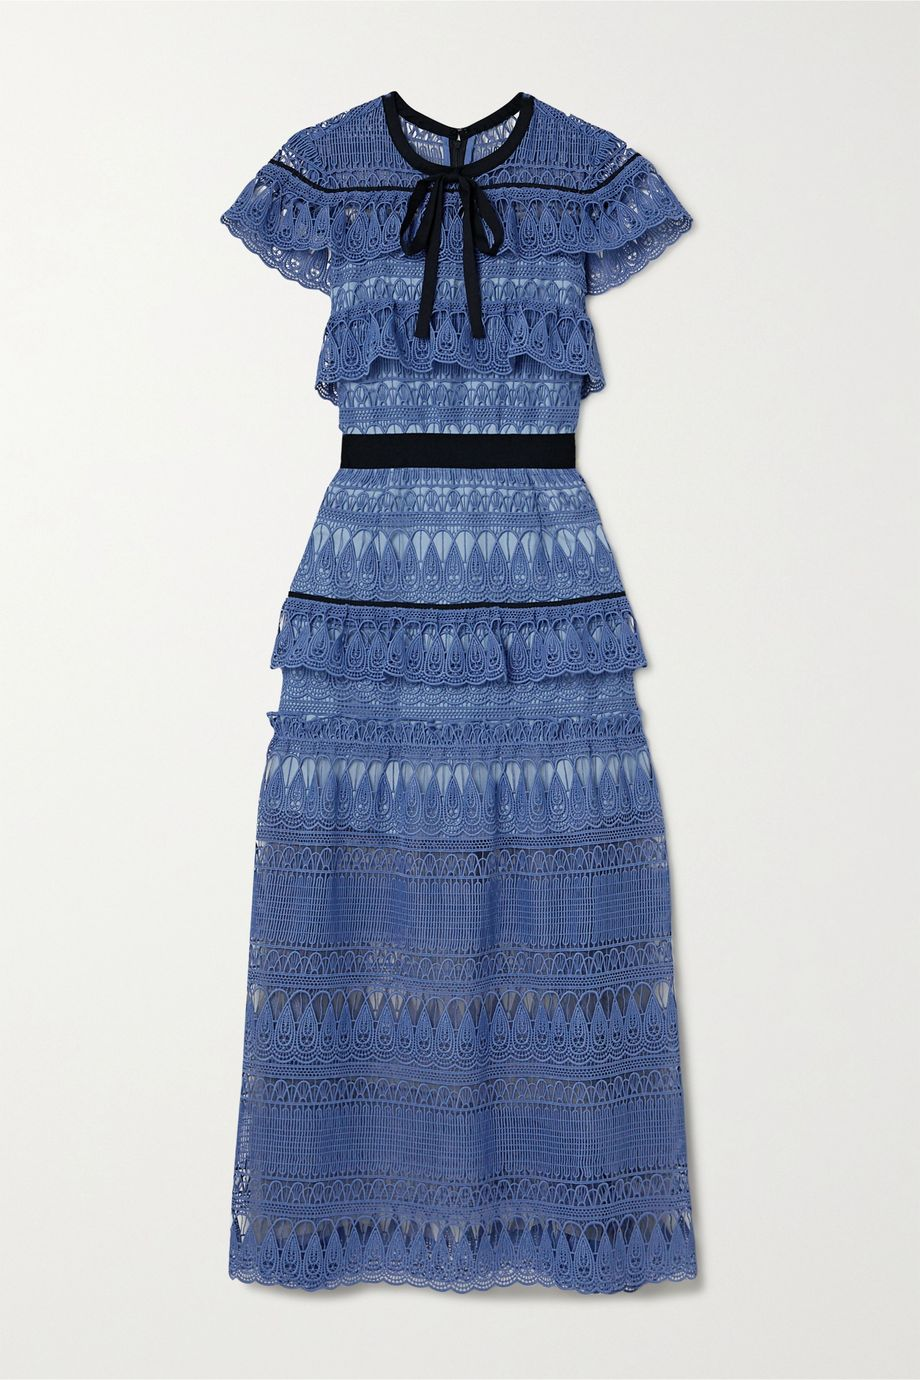 Self-Portrait Daphne grosgrain-trimmed ruffled guipure lace midi dress